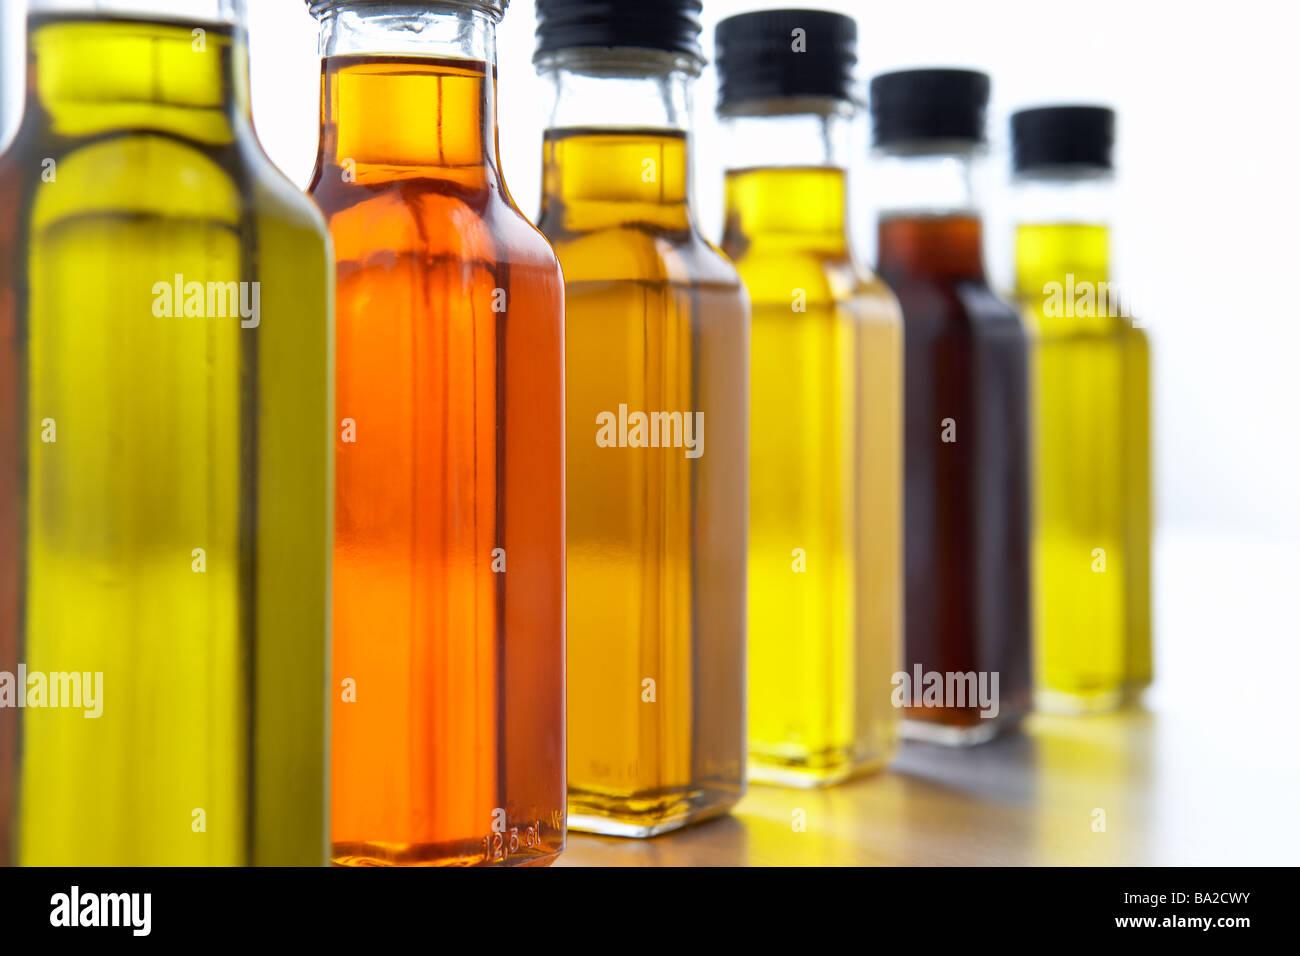 Bottles Of Olive Oil - Stock Image